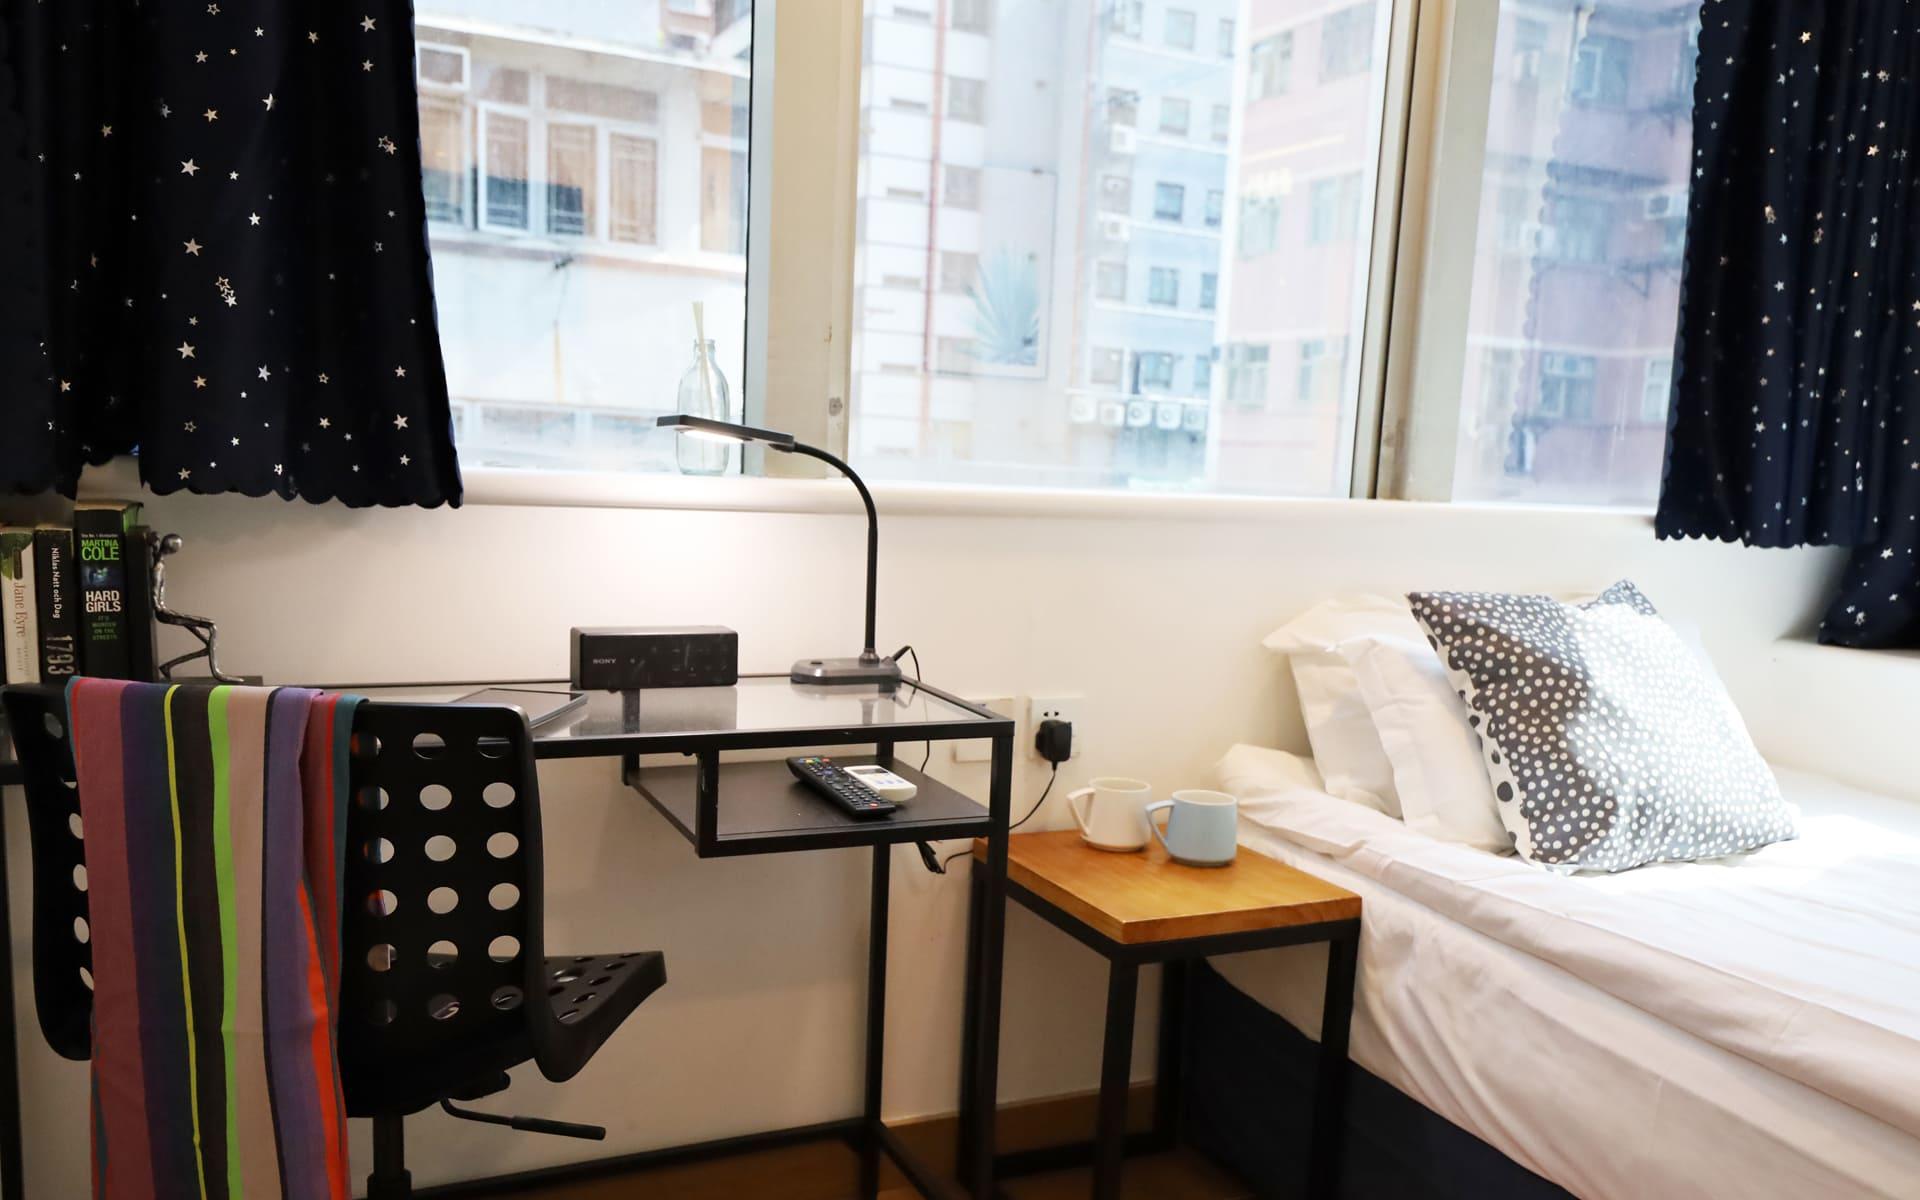 hk_service_apartment_11519486911596784649.jpg